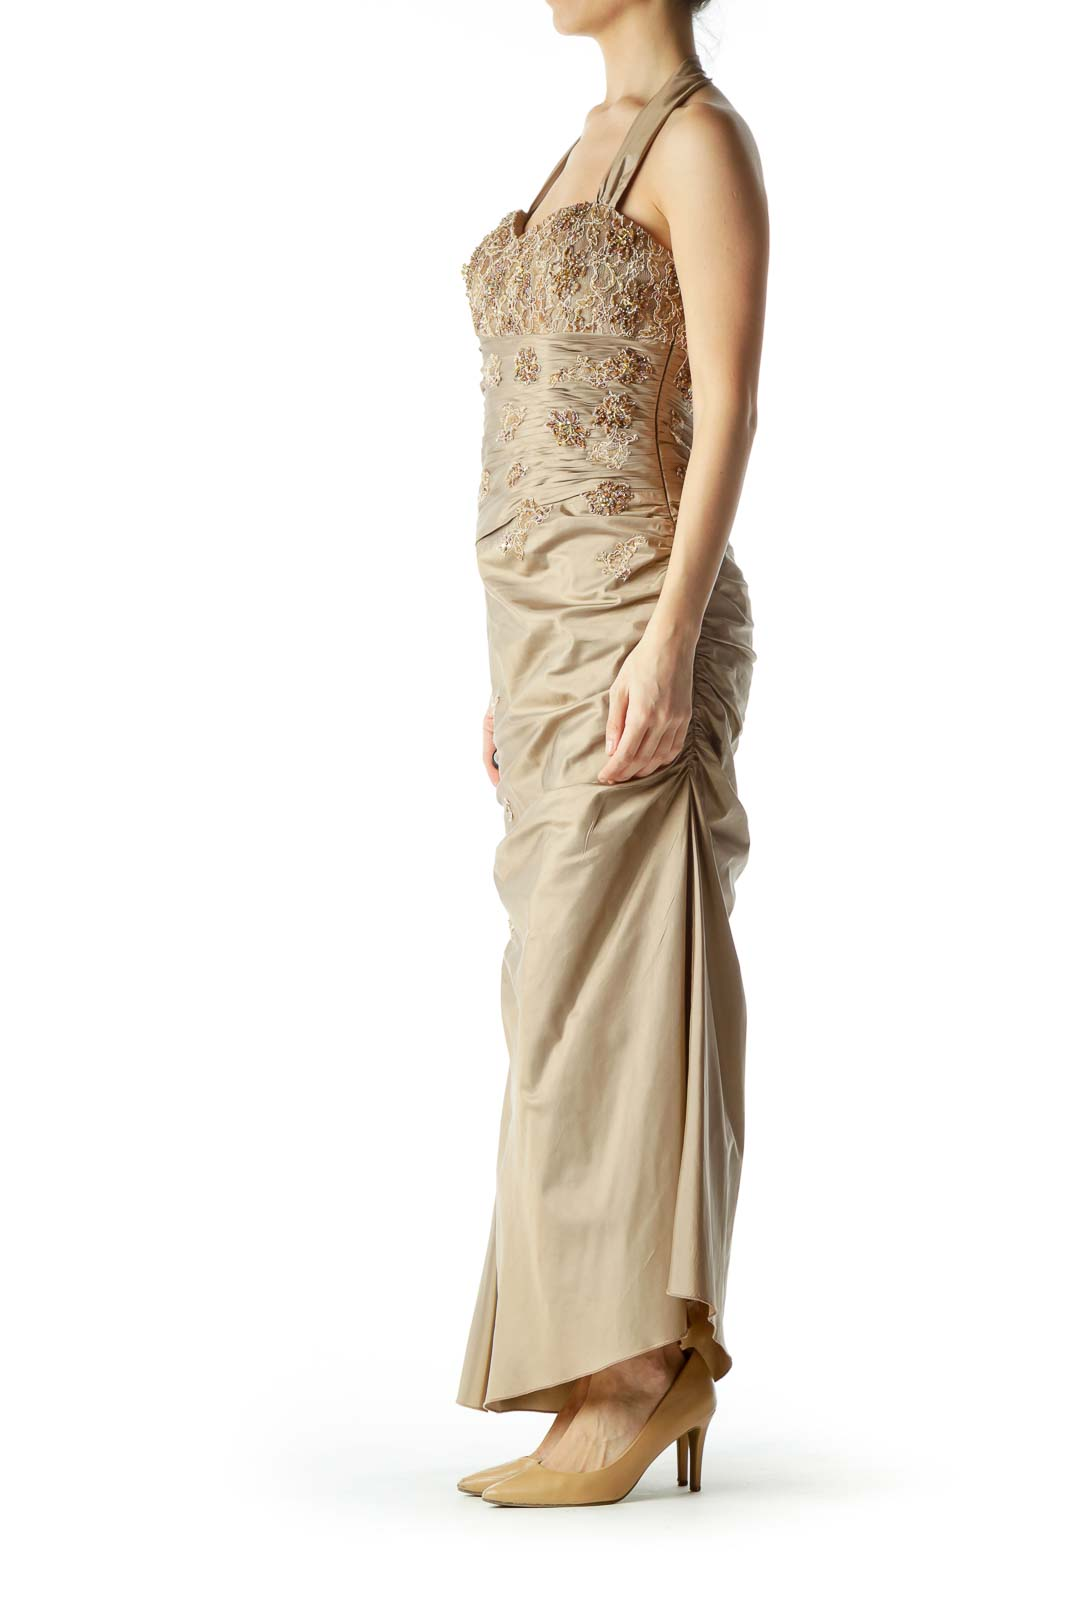 Gold Sweetheart Neckline Halter Evening Dress